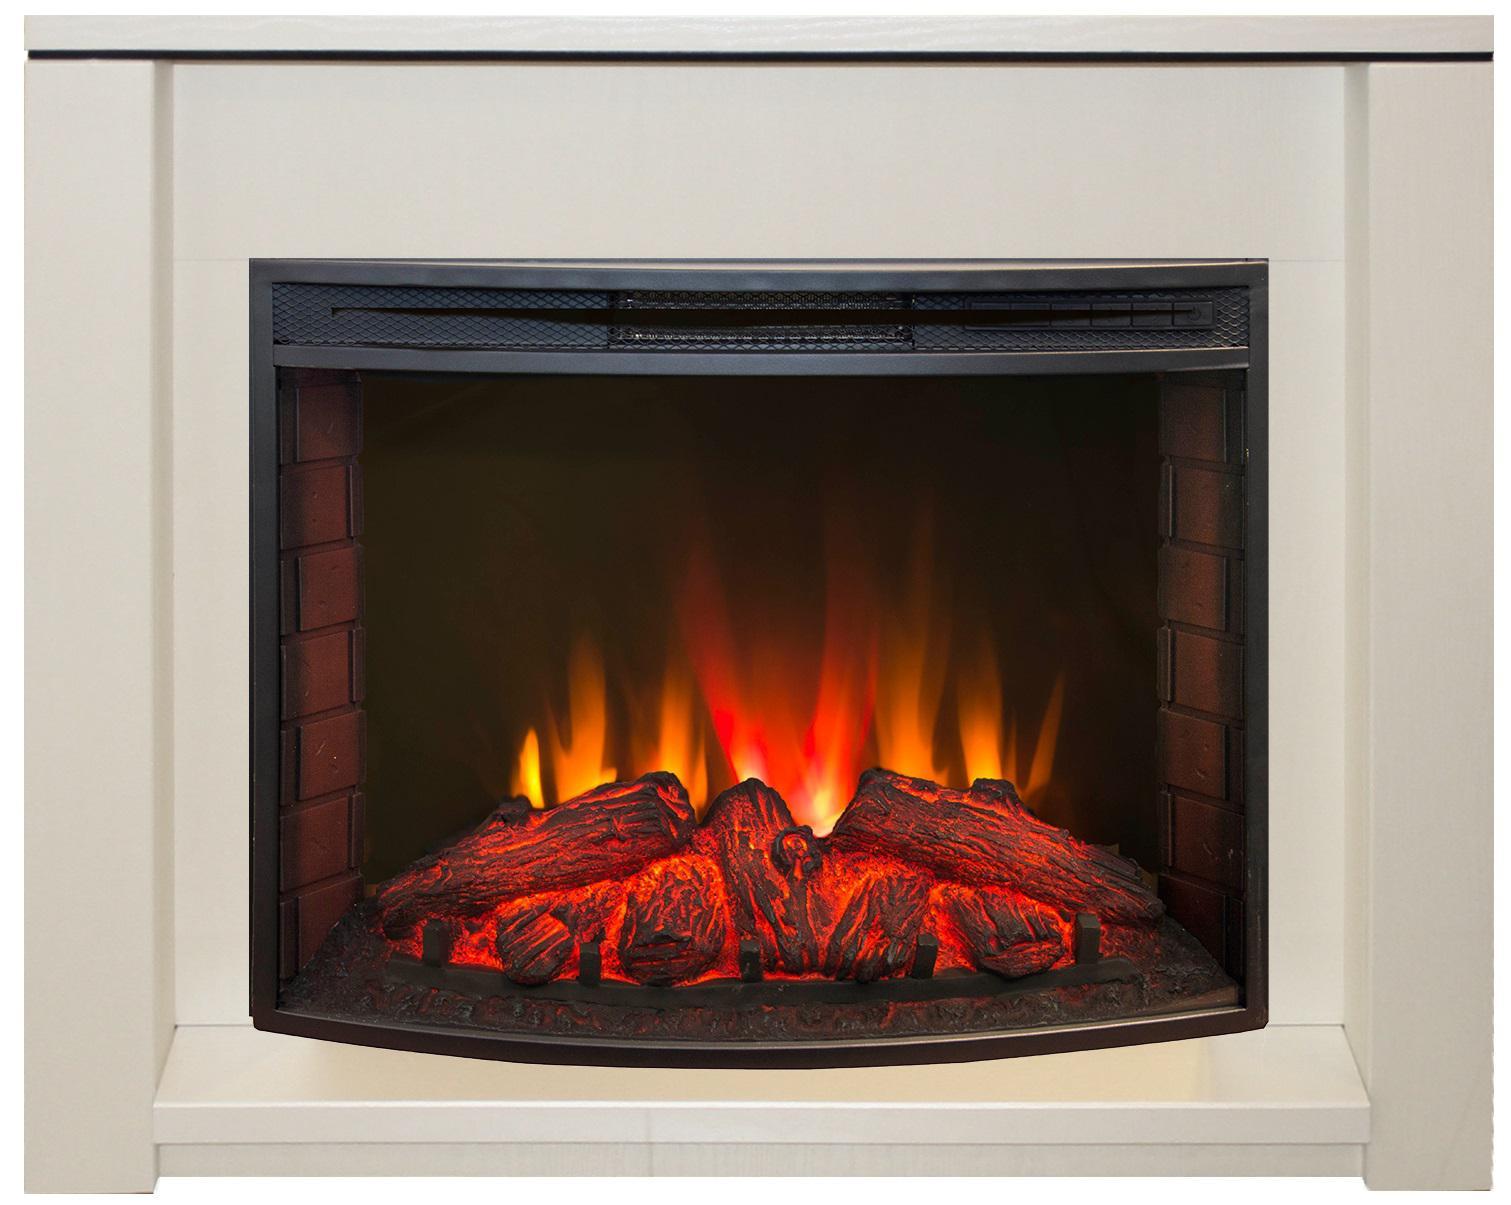 Электрокамин Real flame Skagen 25,5/26 wt+evrika 25,5